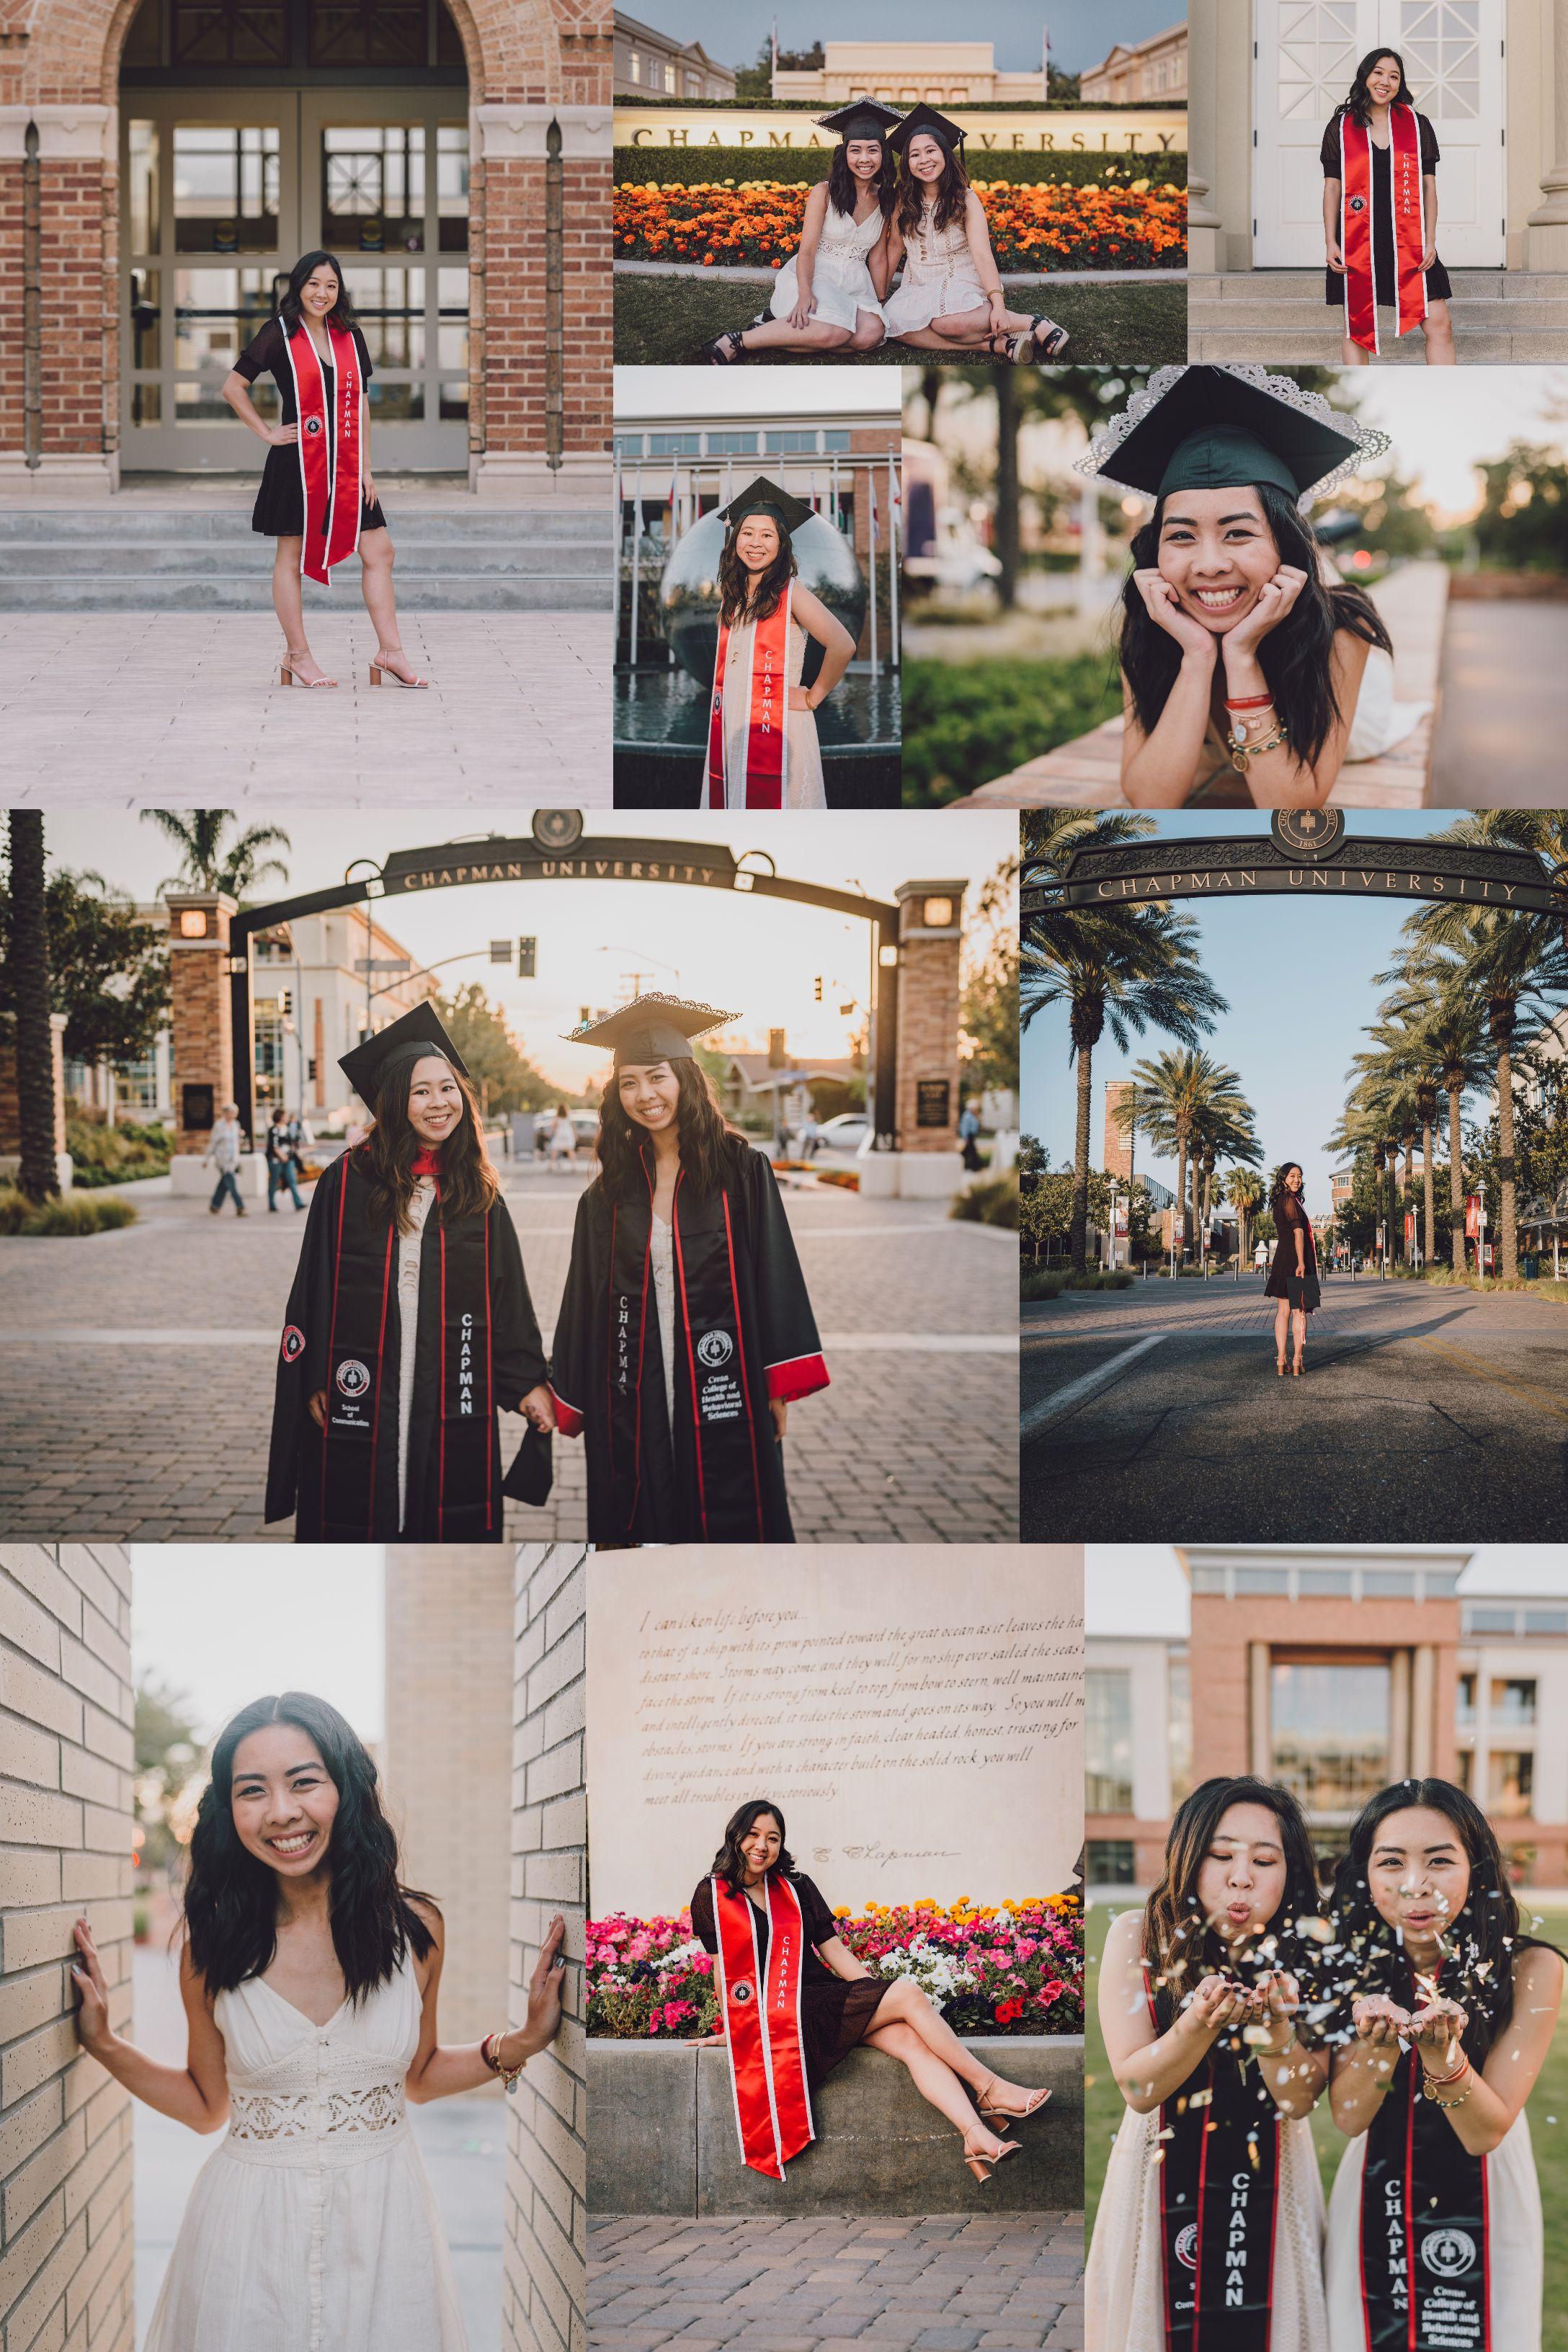 Chapman University Graduation Portrait Inspiration Pose Outfit Location Ideas In 2020 Graduation Portraits Grad Photoshoot Graduation Photoshoot